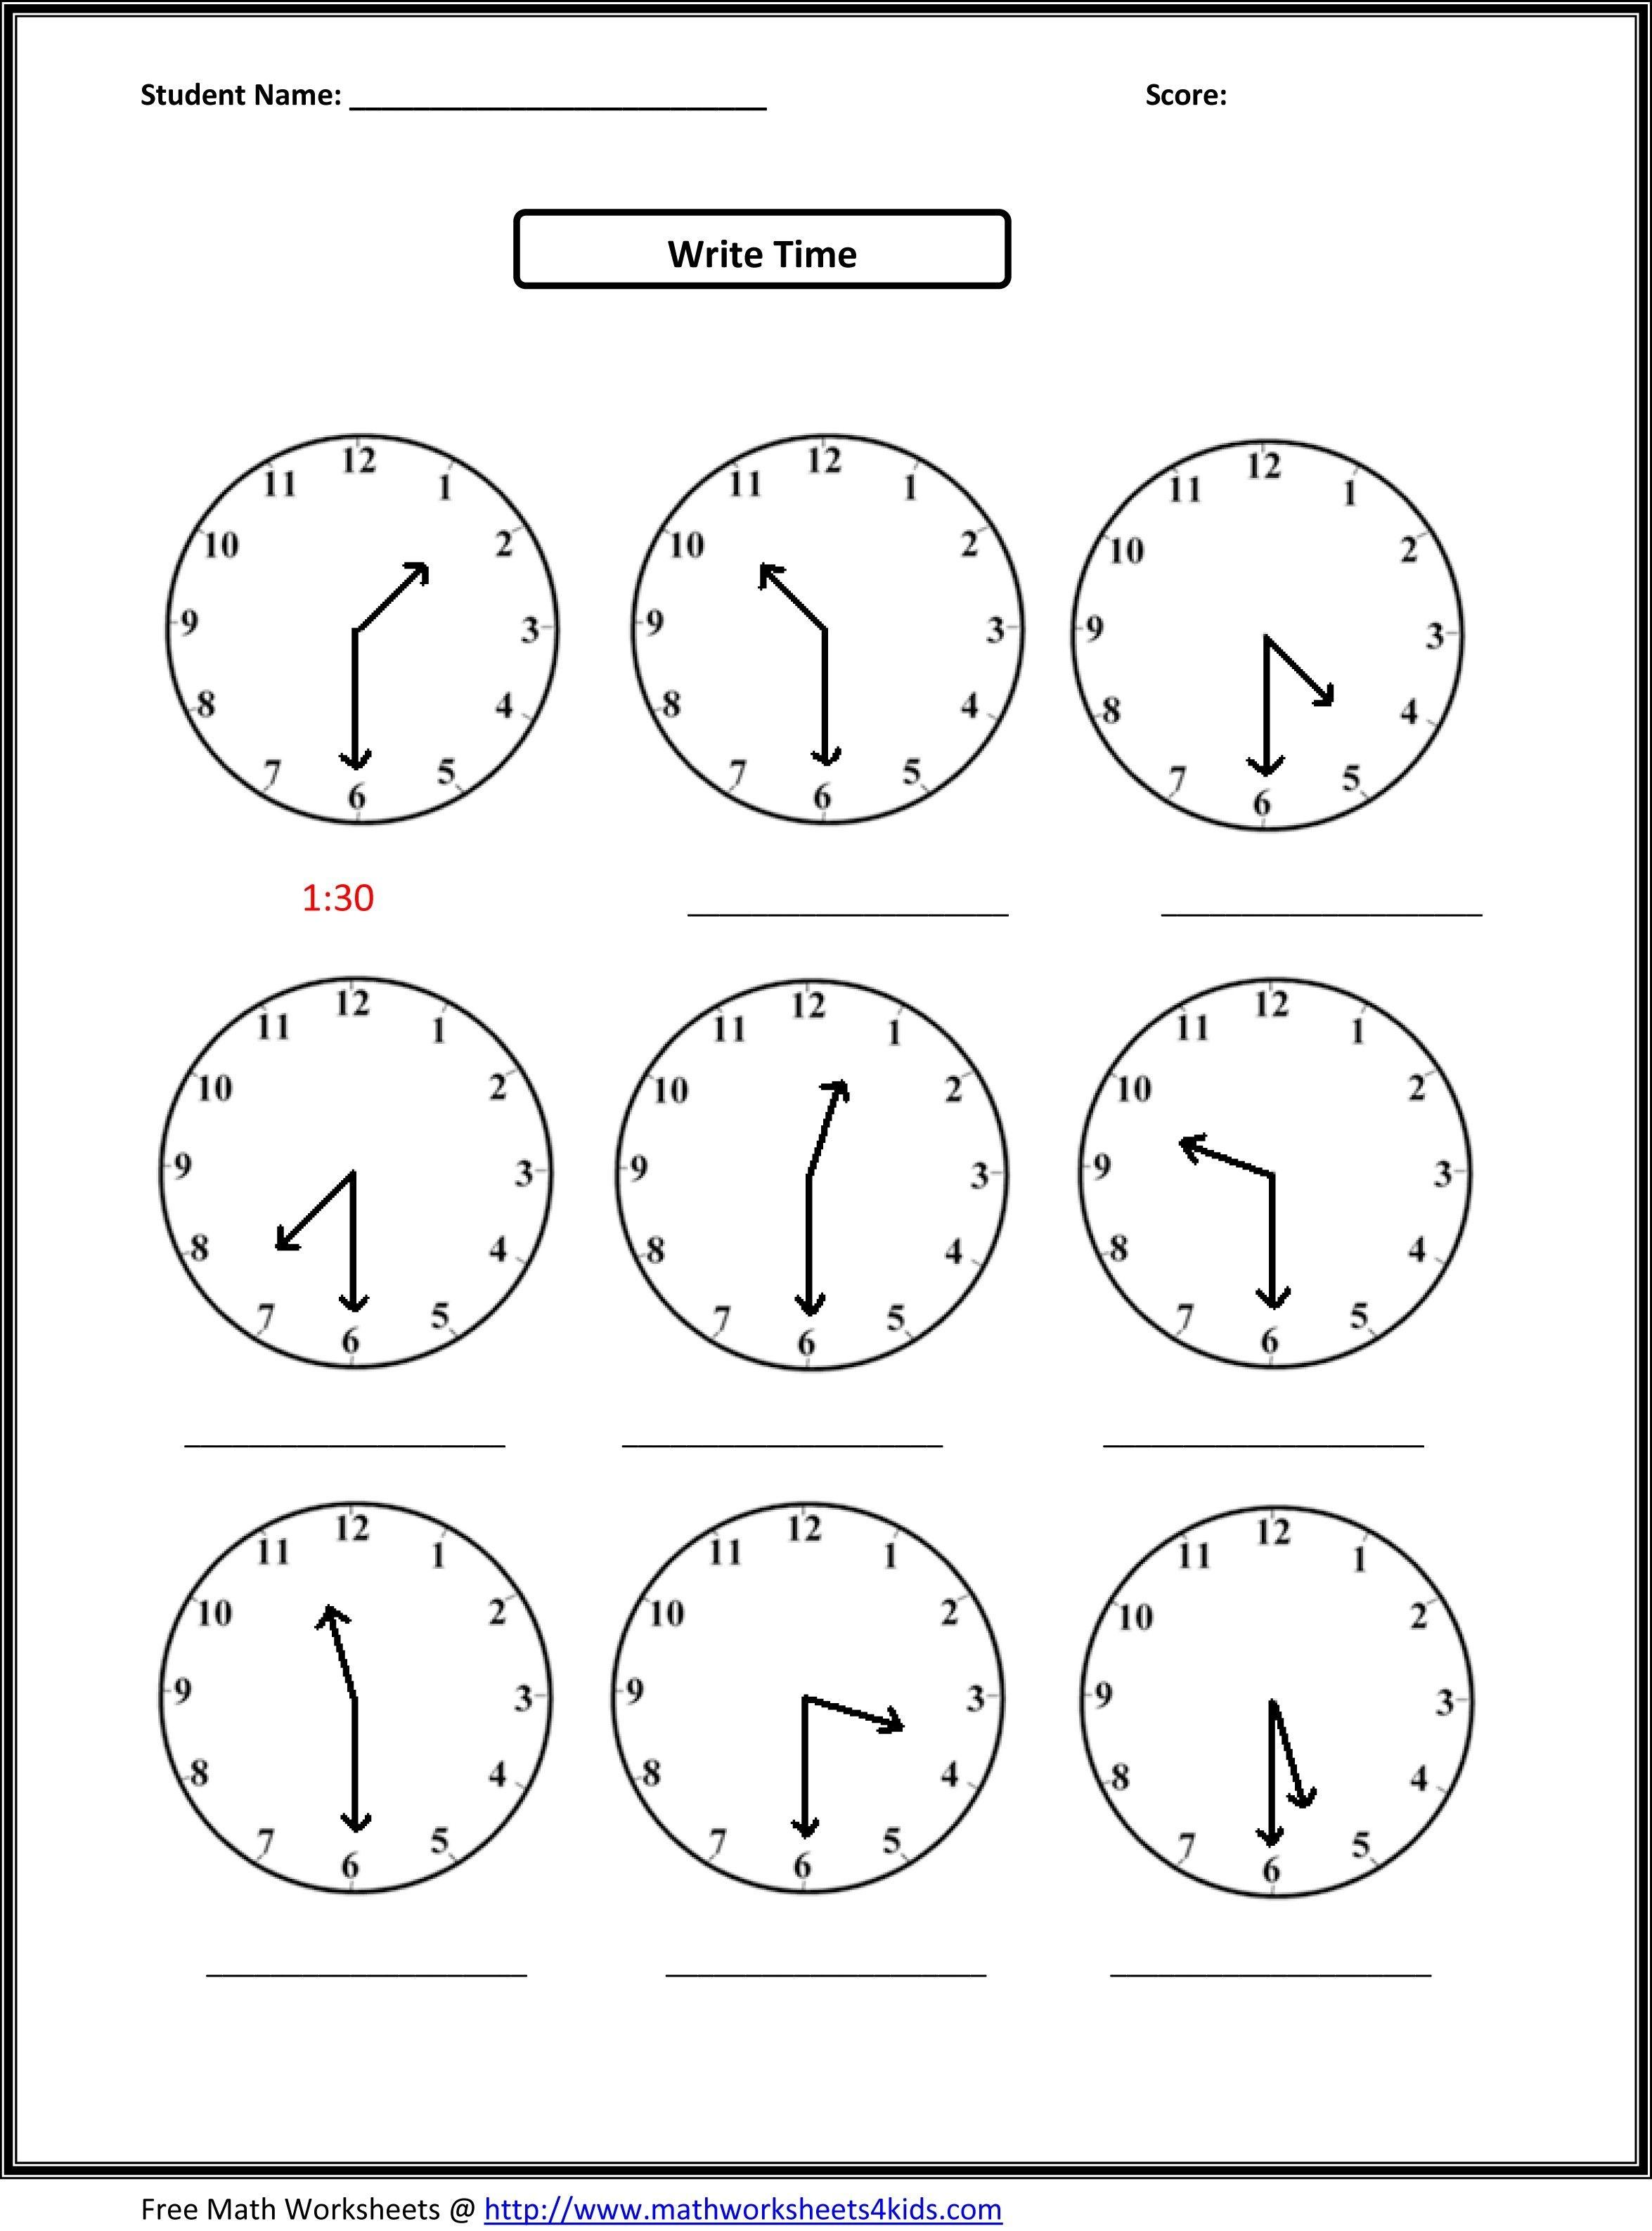 2Nd Grade Free Worksheets Math | Math: Time/measurement | 2Nd Grade - Free Printable Second Grade Math Worksheets